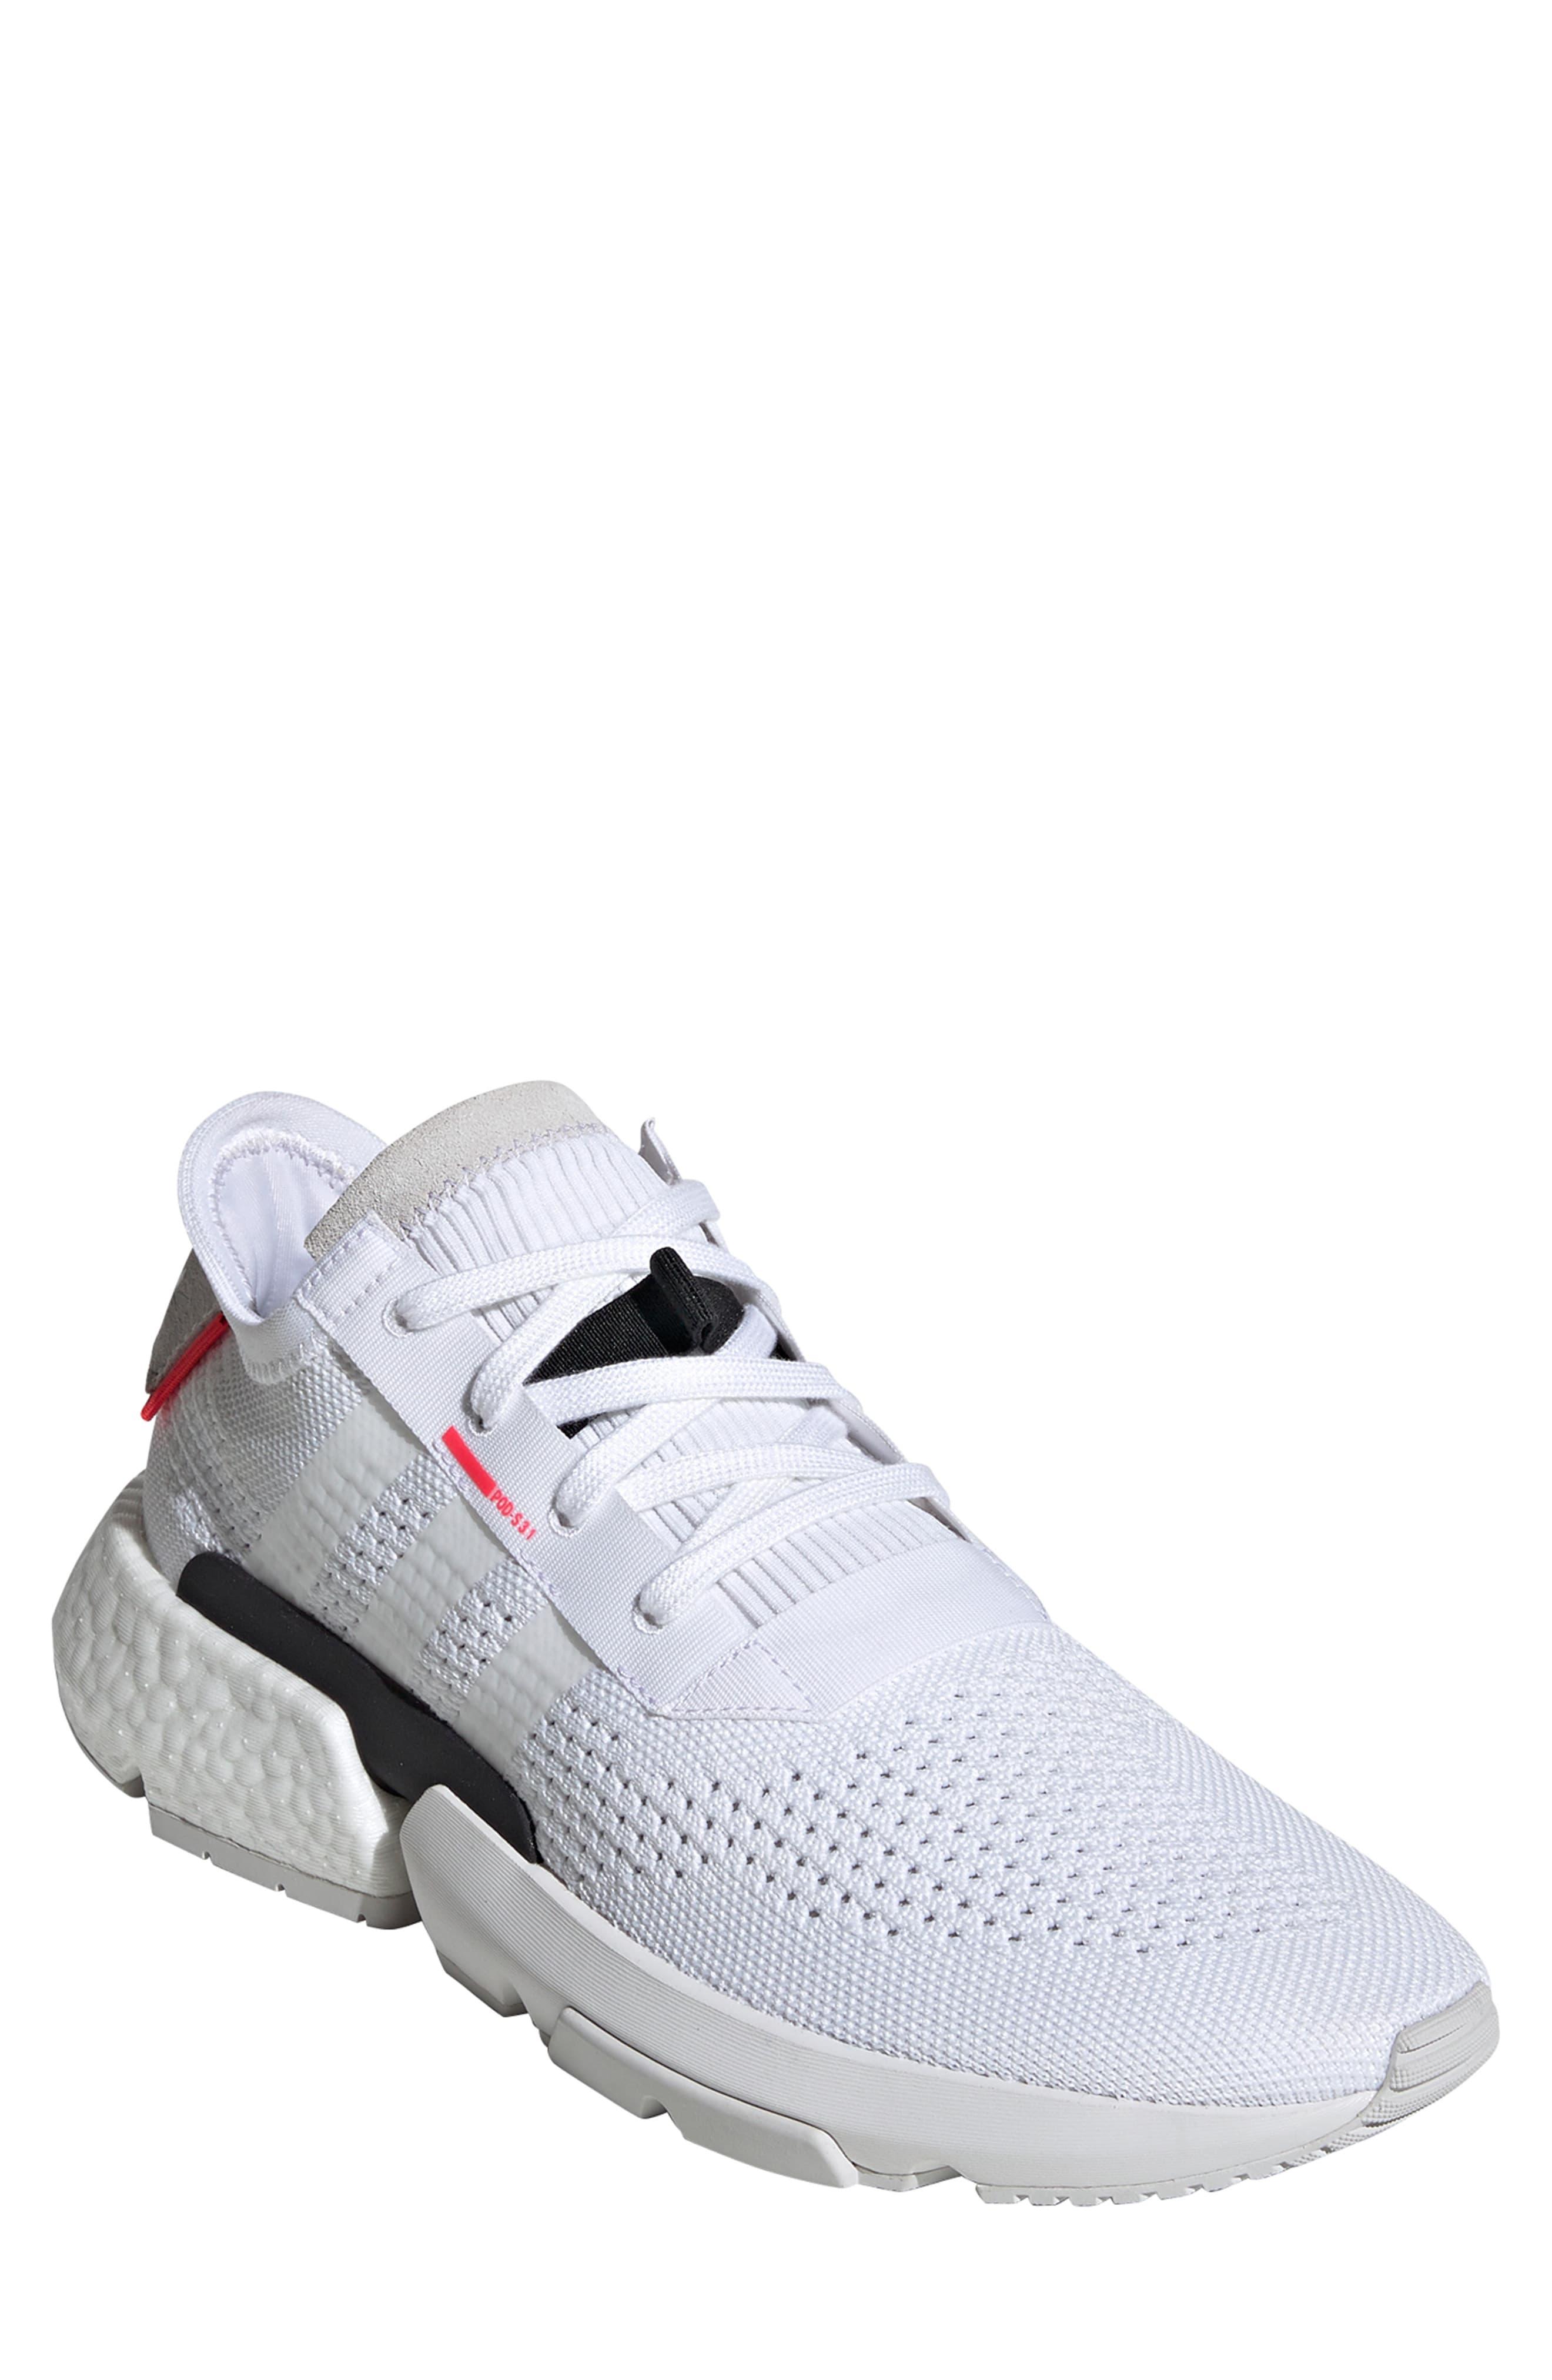 Nike Vegan Athletic Shoes for Men for Sale   Shop Men's